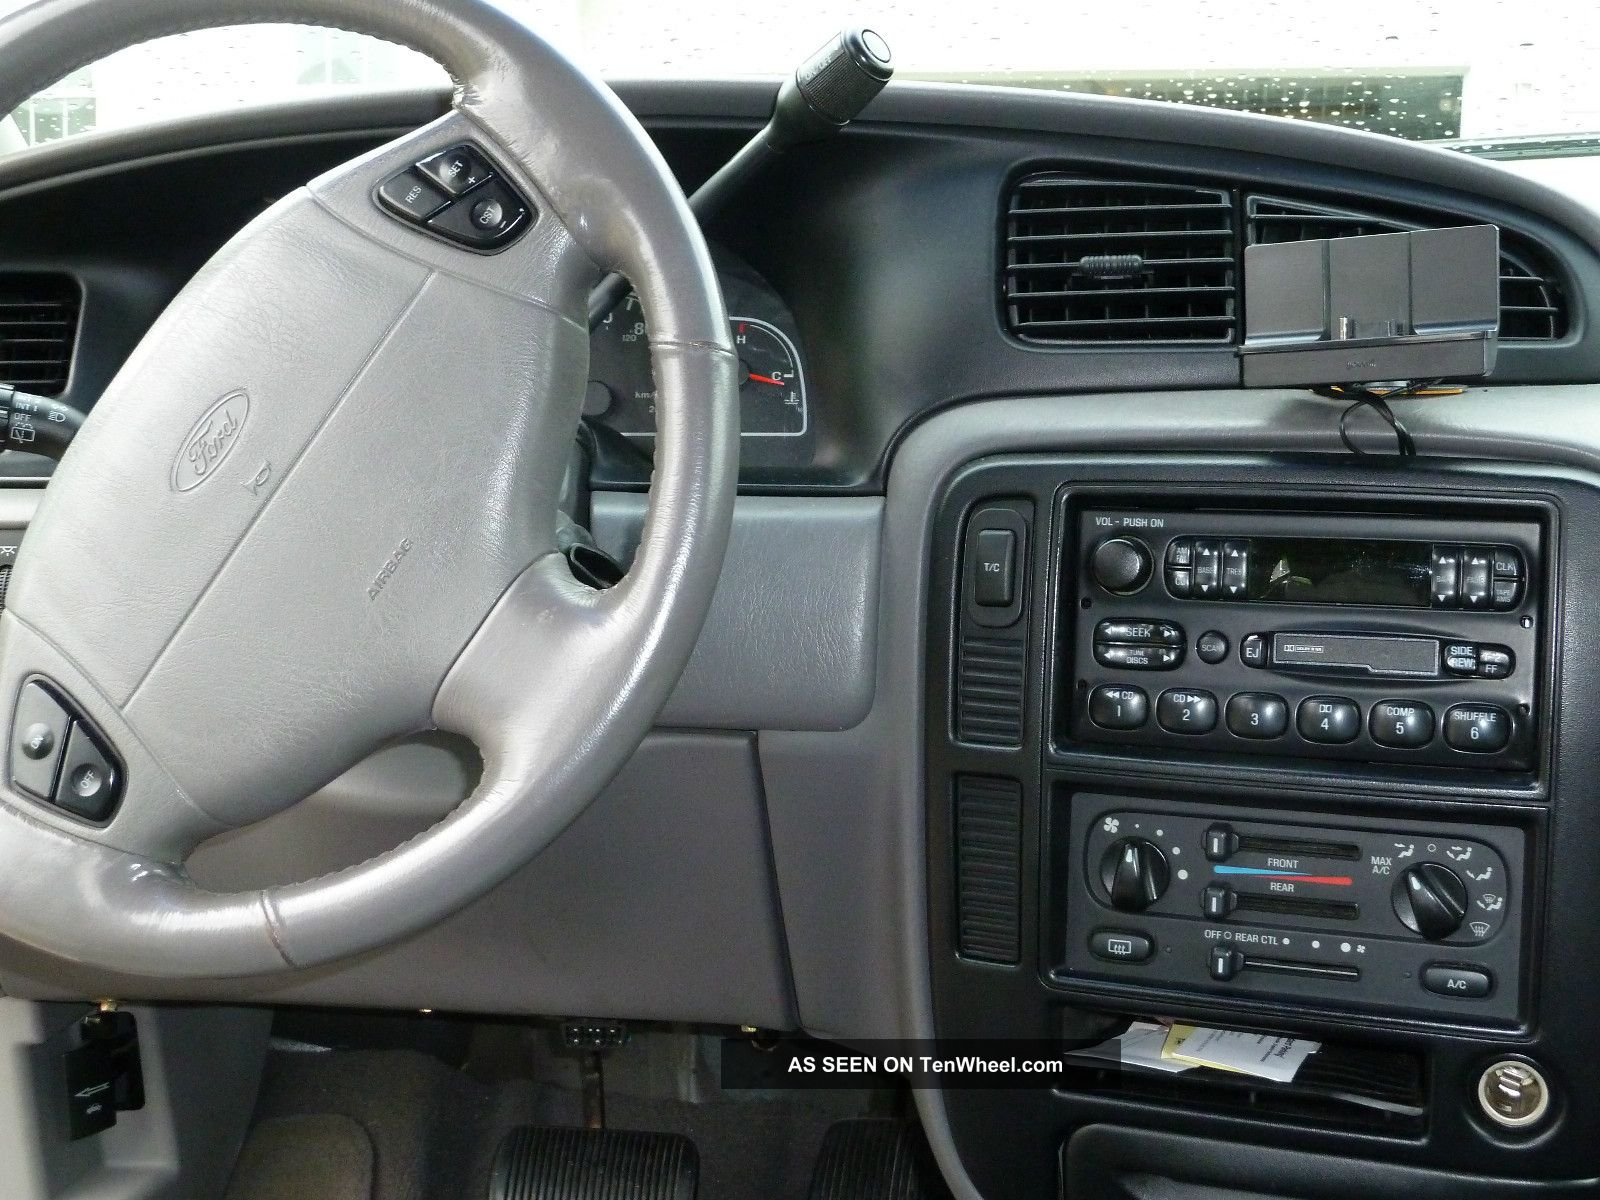 2000 ford windstar image 24